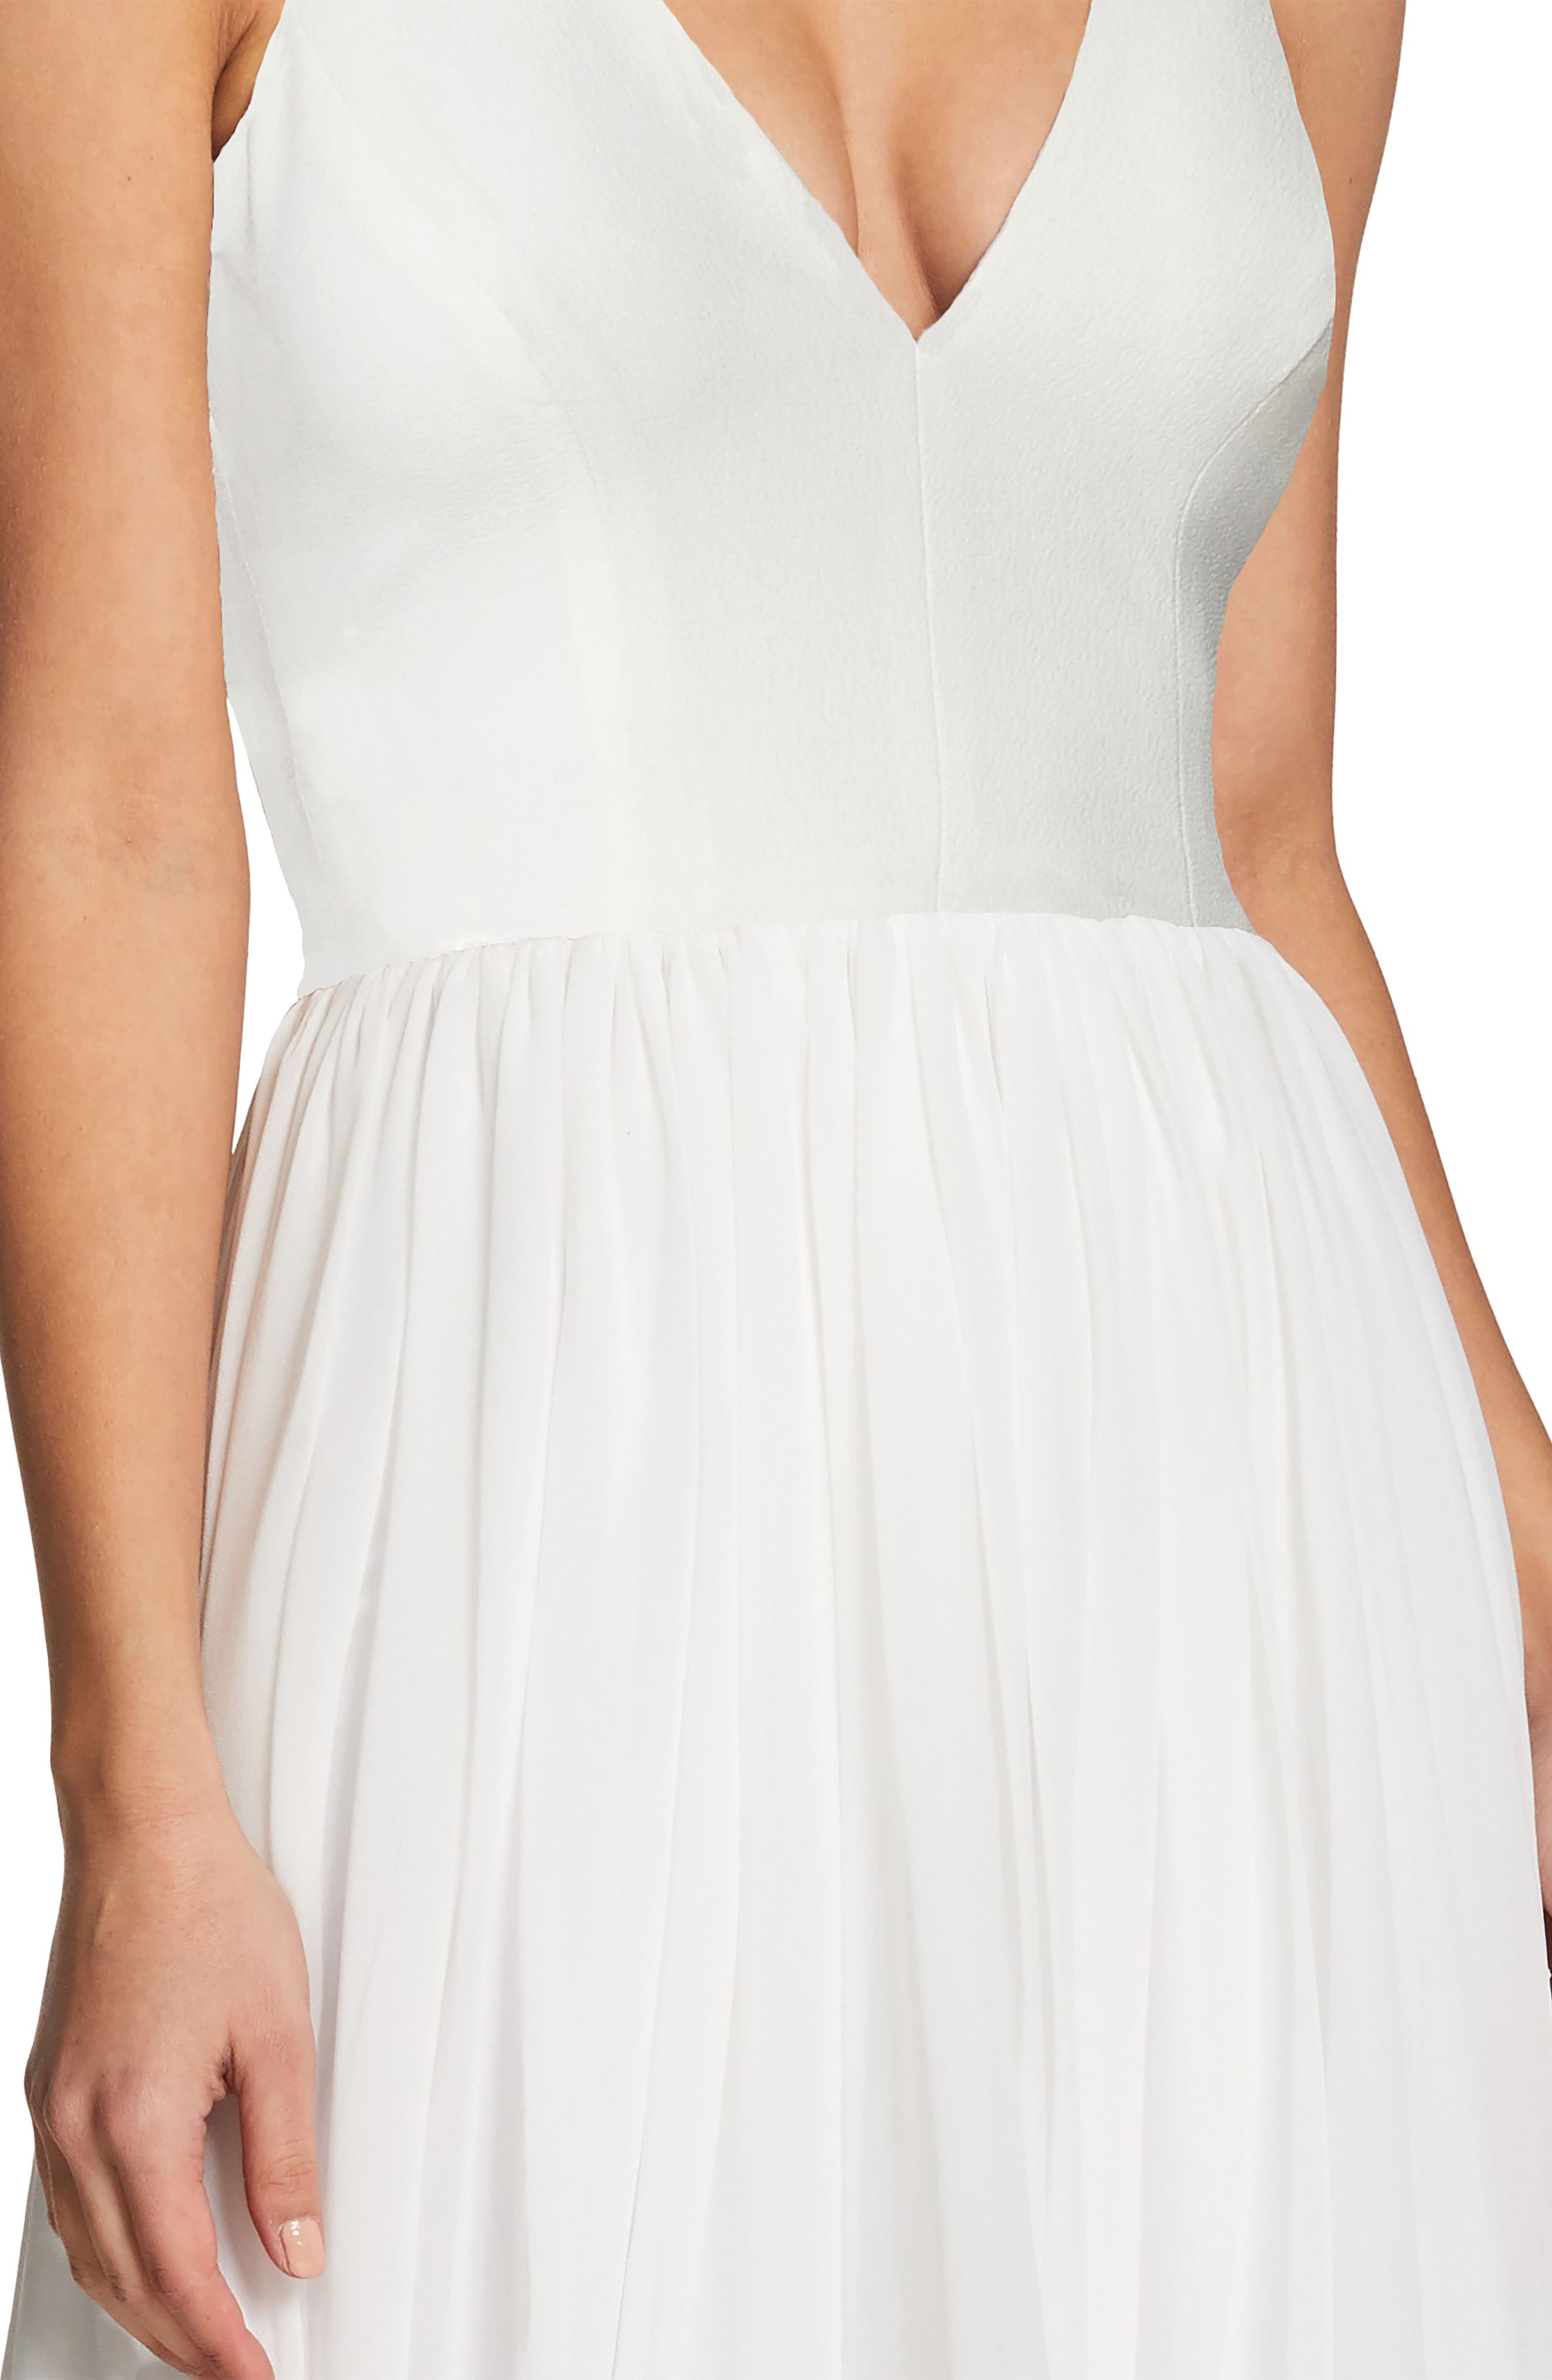 Alicia Mixed Media Midi Dress,                             Alternate thumbnail 4, color,                             OFF WHITE